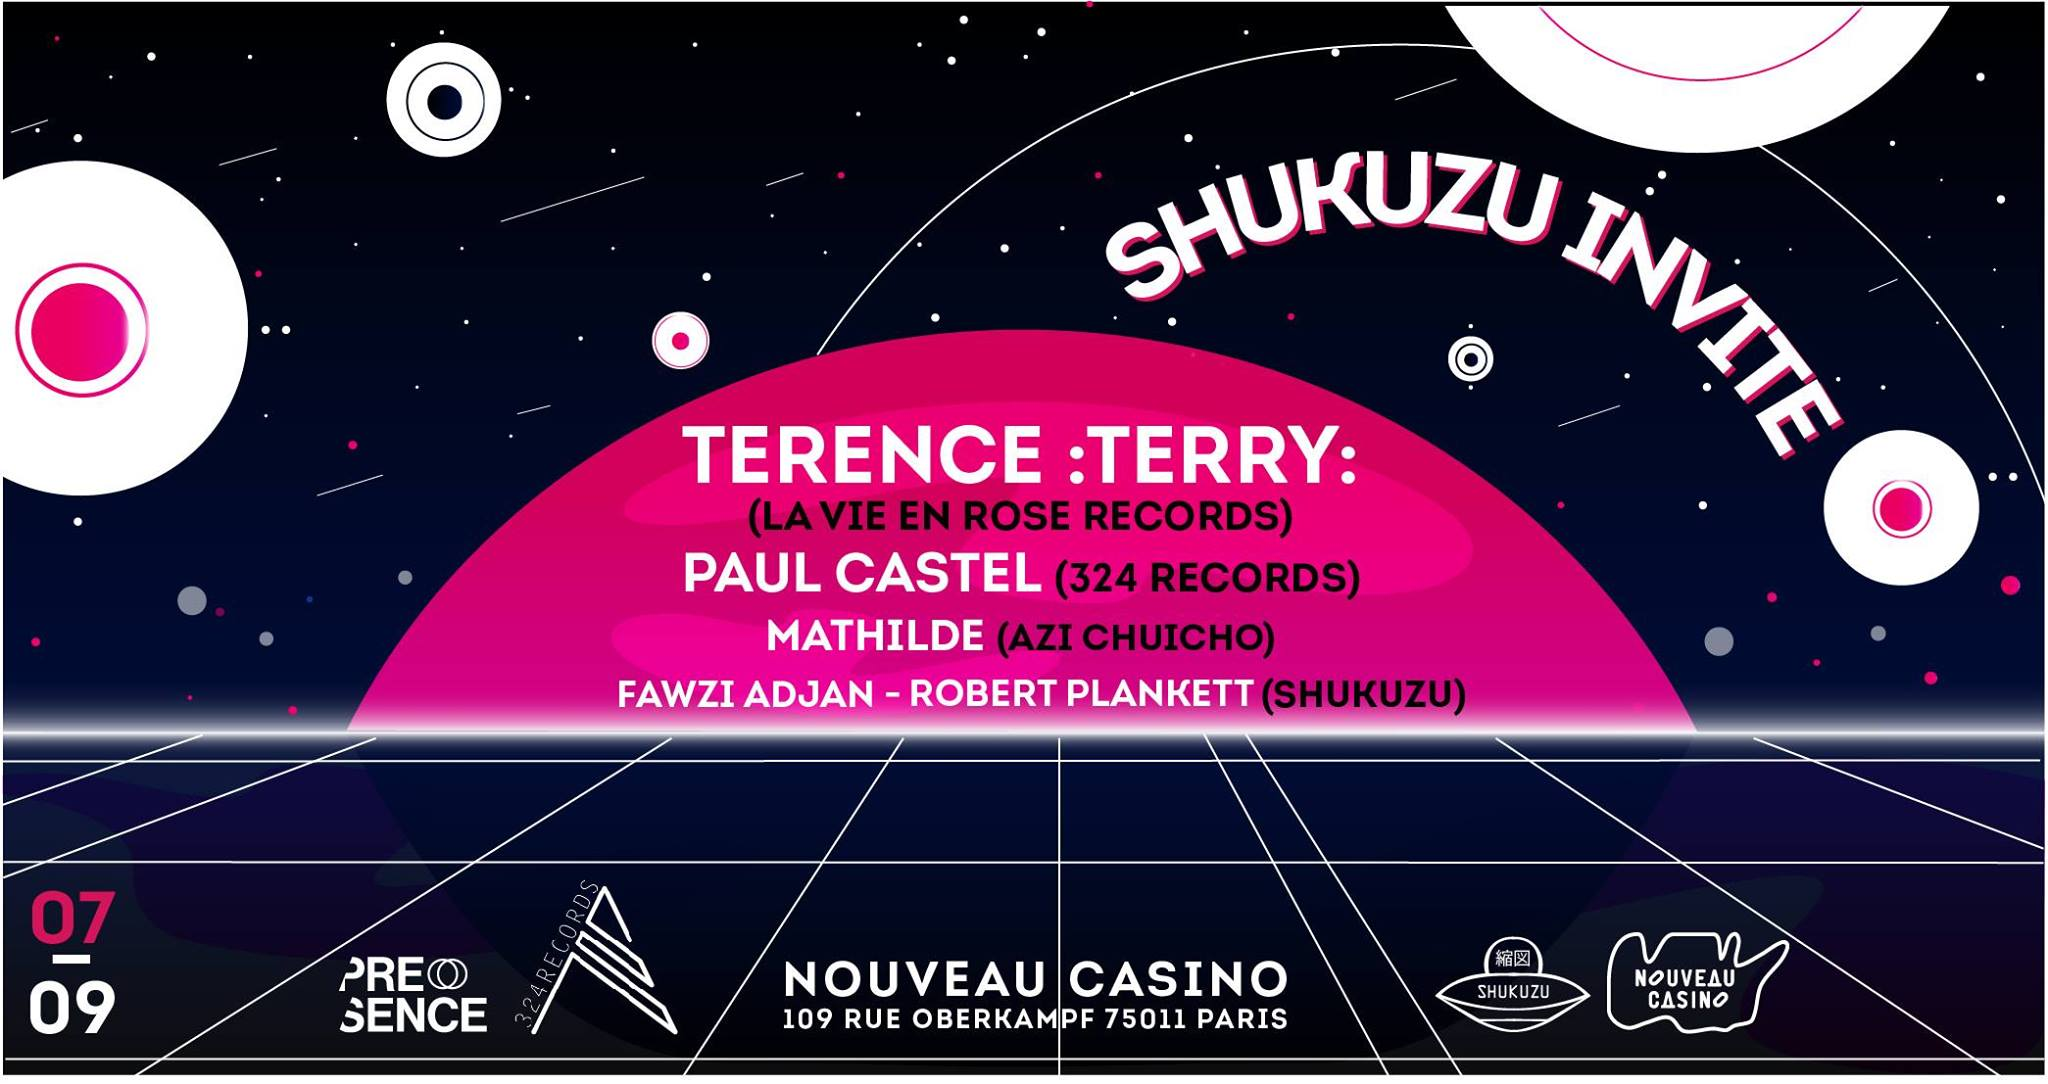 Shukuzu invite: Terence :Terry: